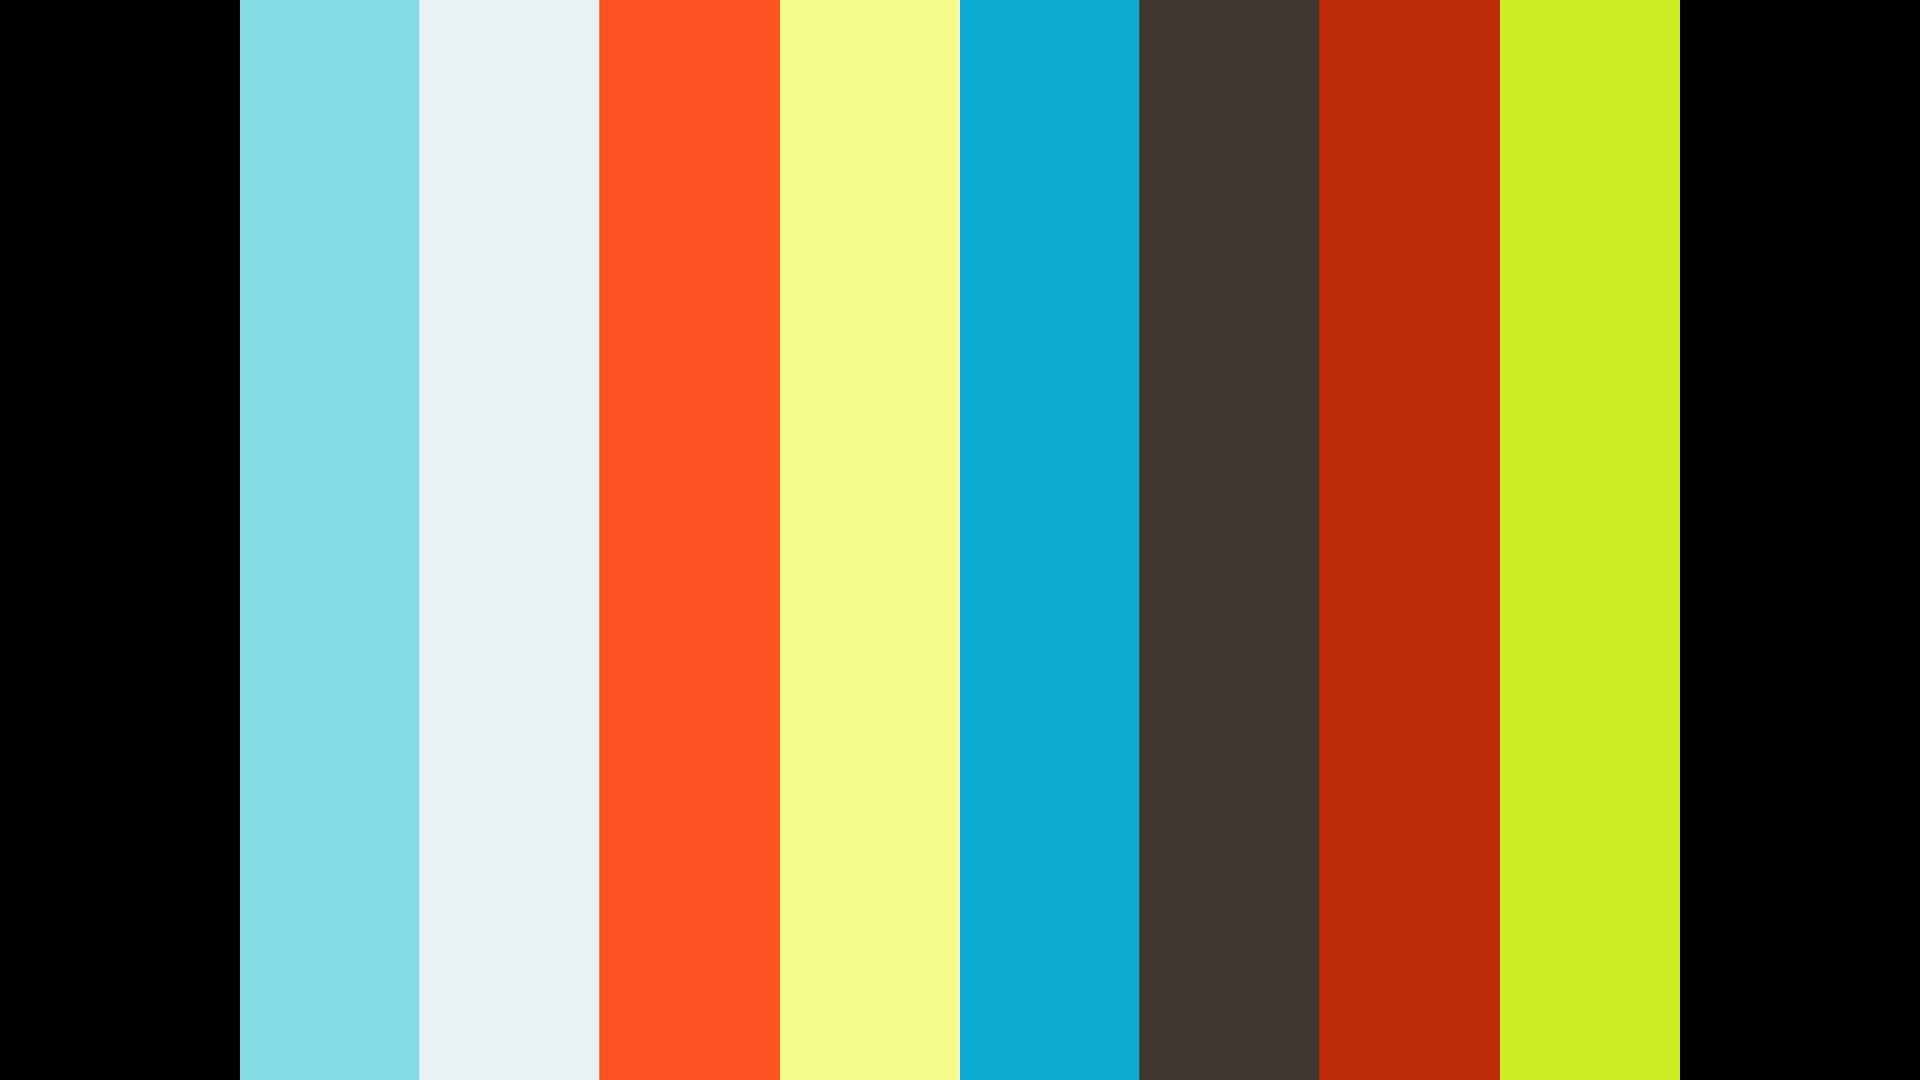 2021_05_03 - Brad - SCOOP 1k Series Saver